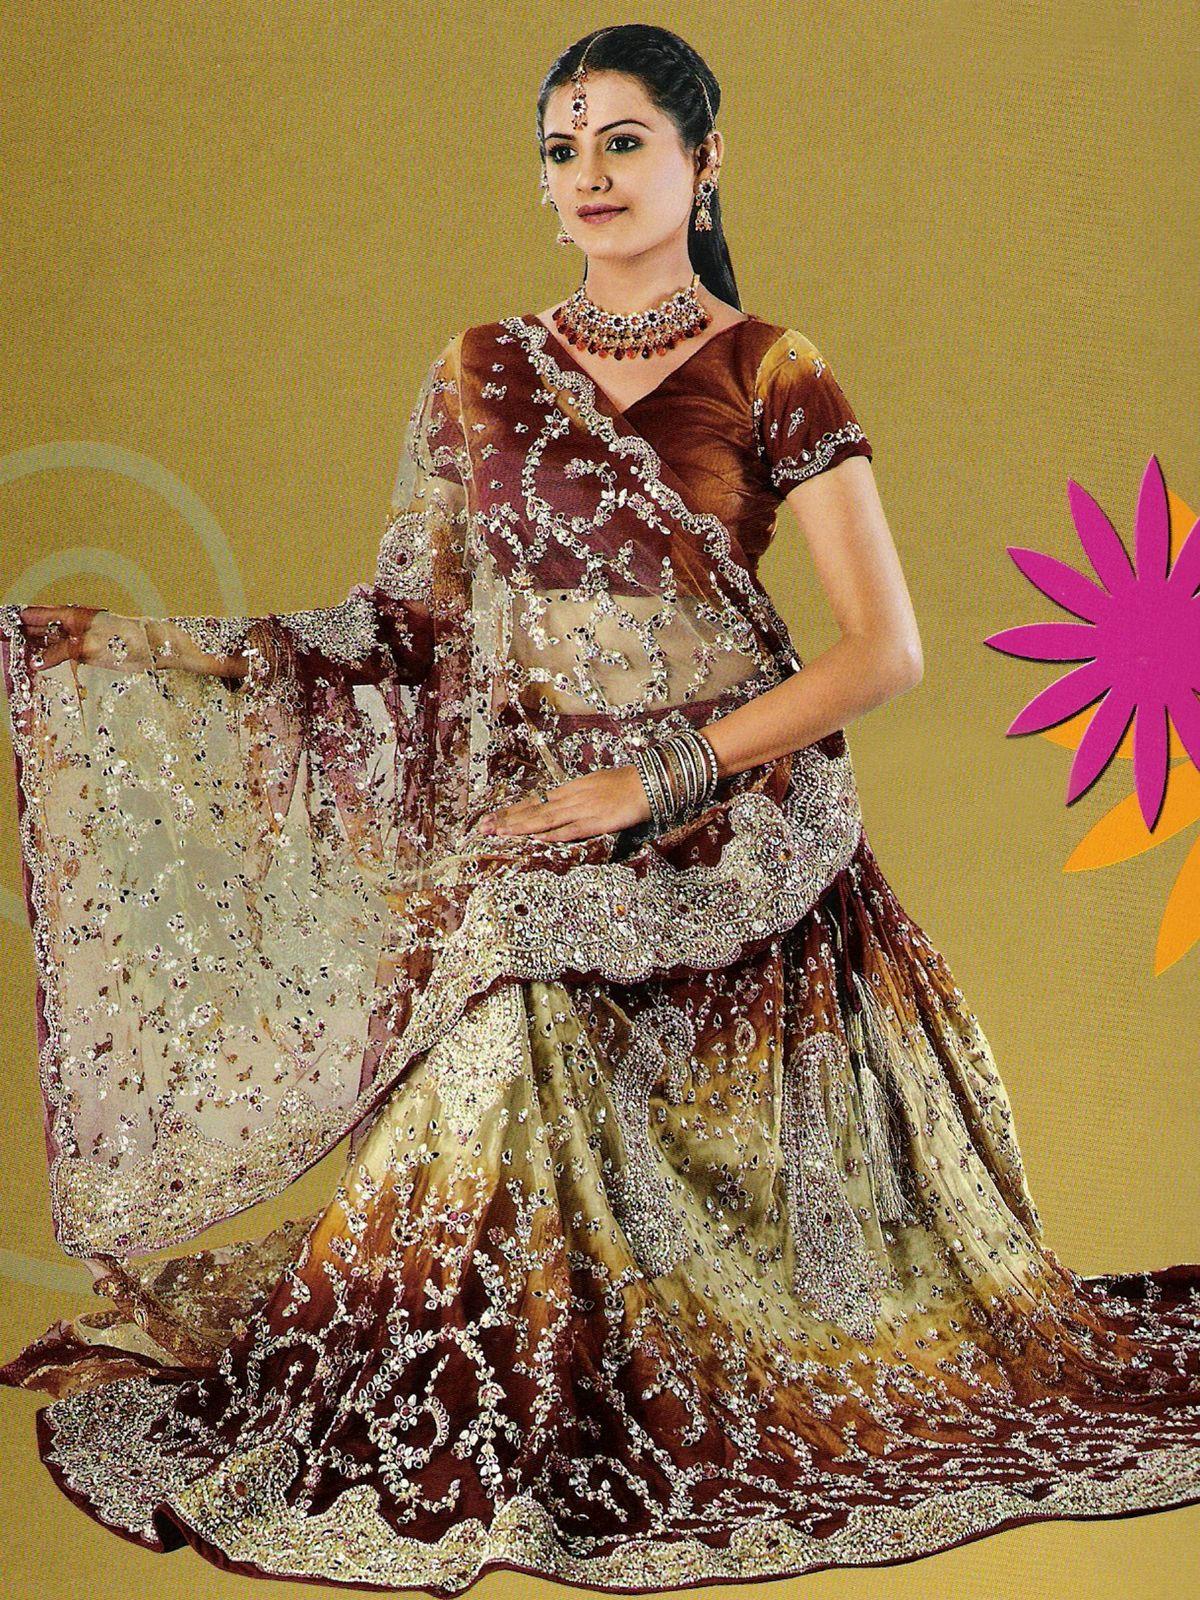 Latest Fashion: Bridal Lenghas-Bridal Lehenga Choli-Latest